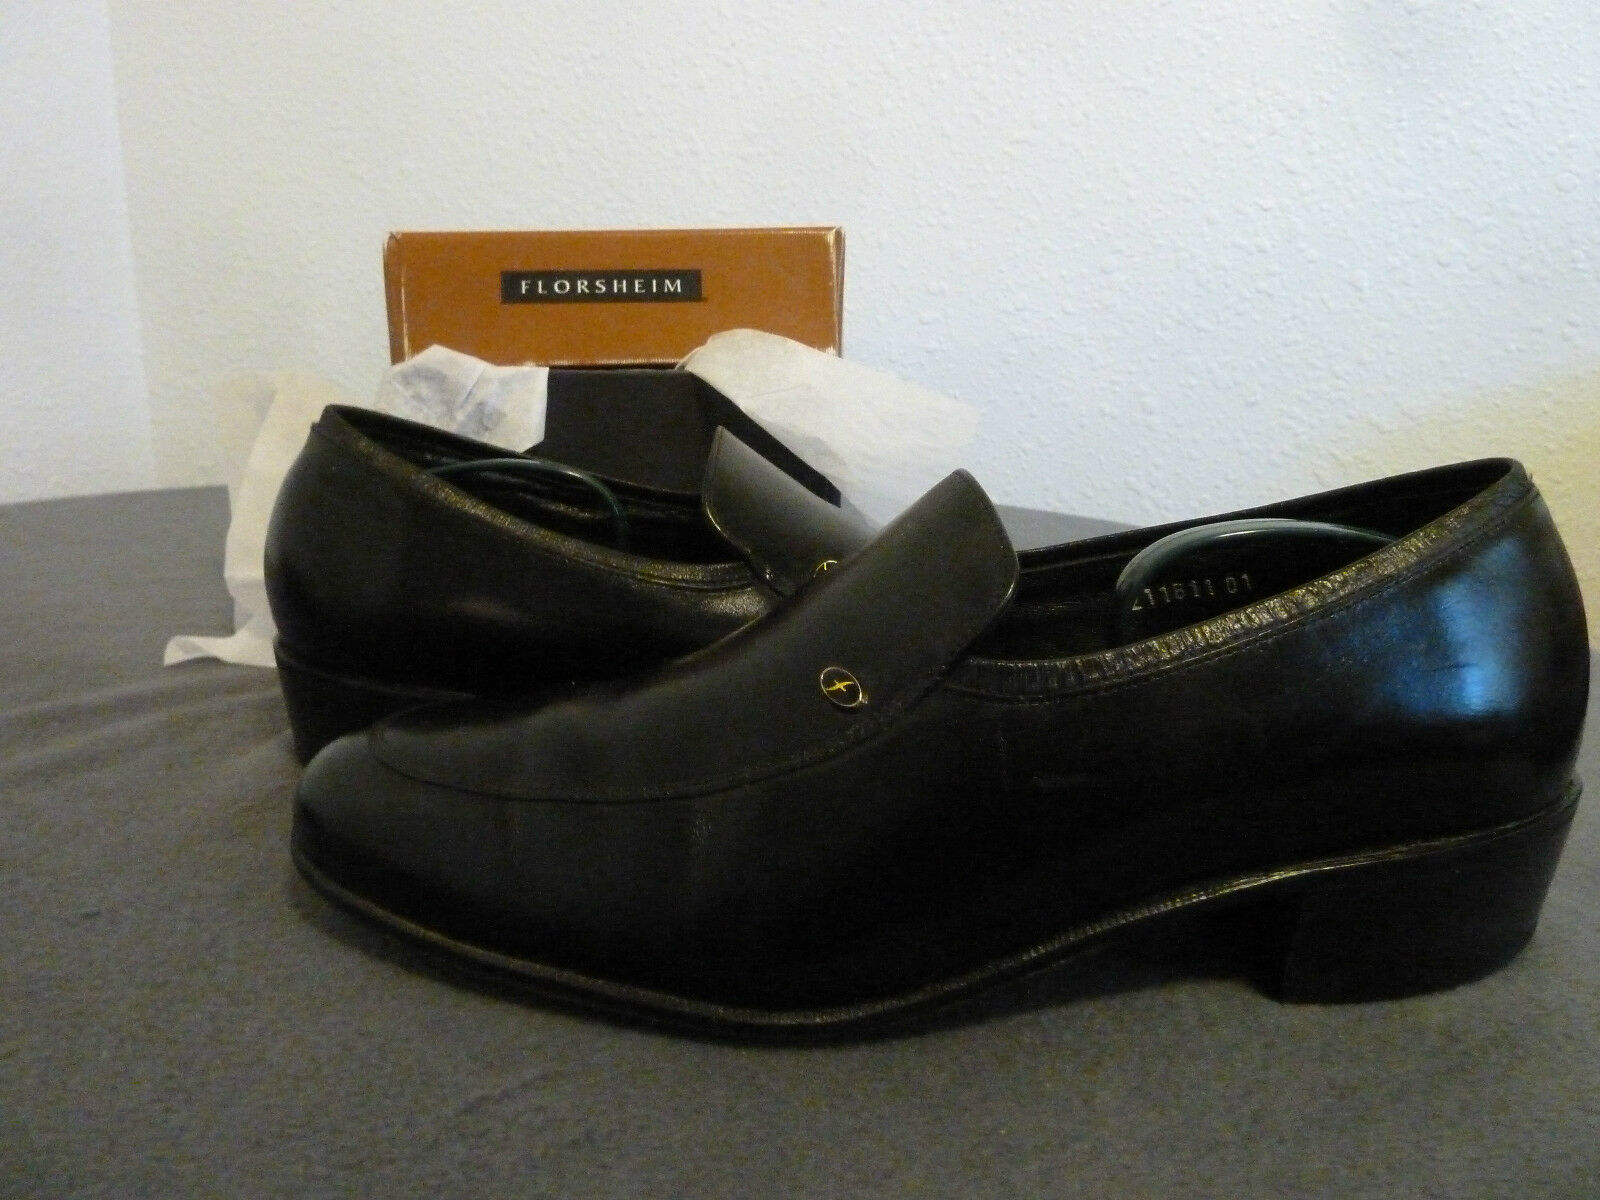 MEN'S SIZE 9 3E FLORSHEIM GENUINE DRESS SHOES W/BOX BLACK GENUINE FLORSHEIM LEATHER ec0622